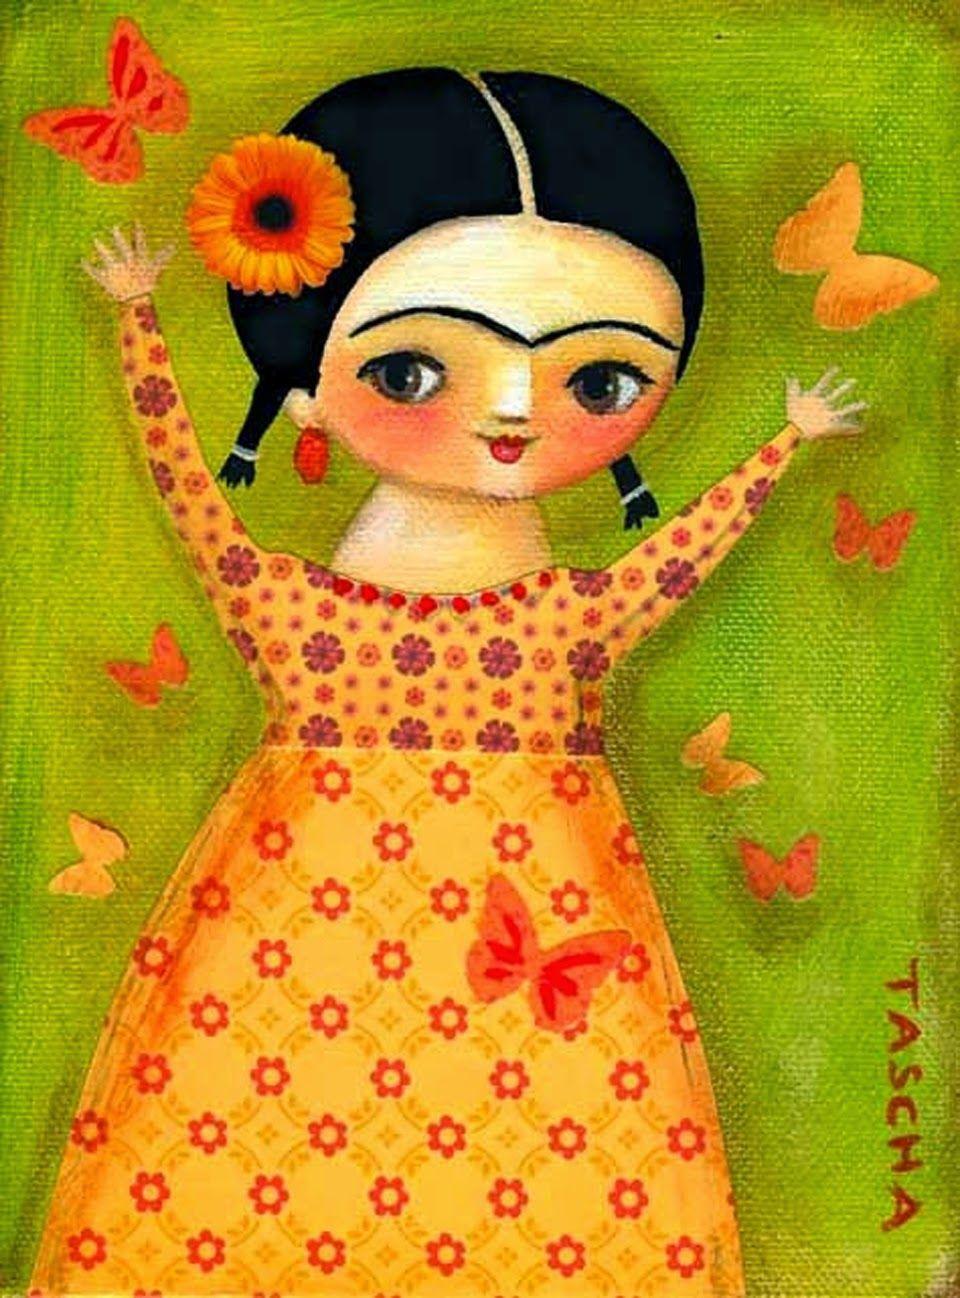 ORIGINAL Canvas Painting Frida Kahlo Springtime Mixed Media By Tascha